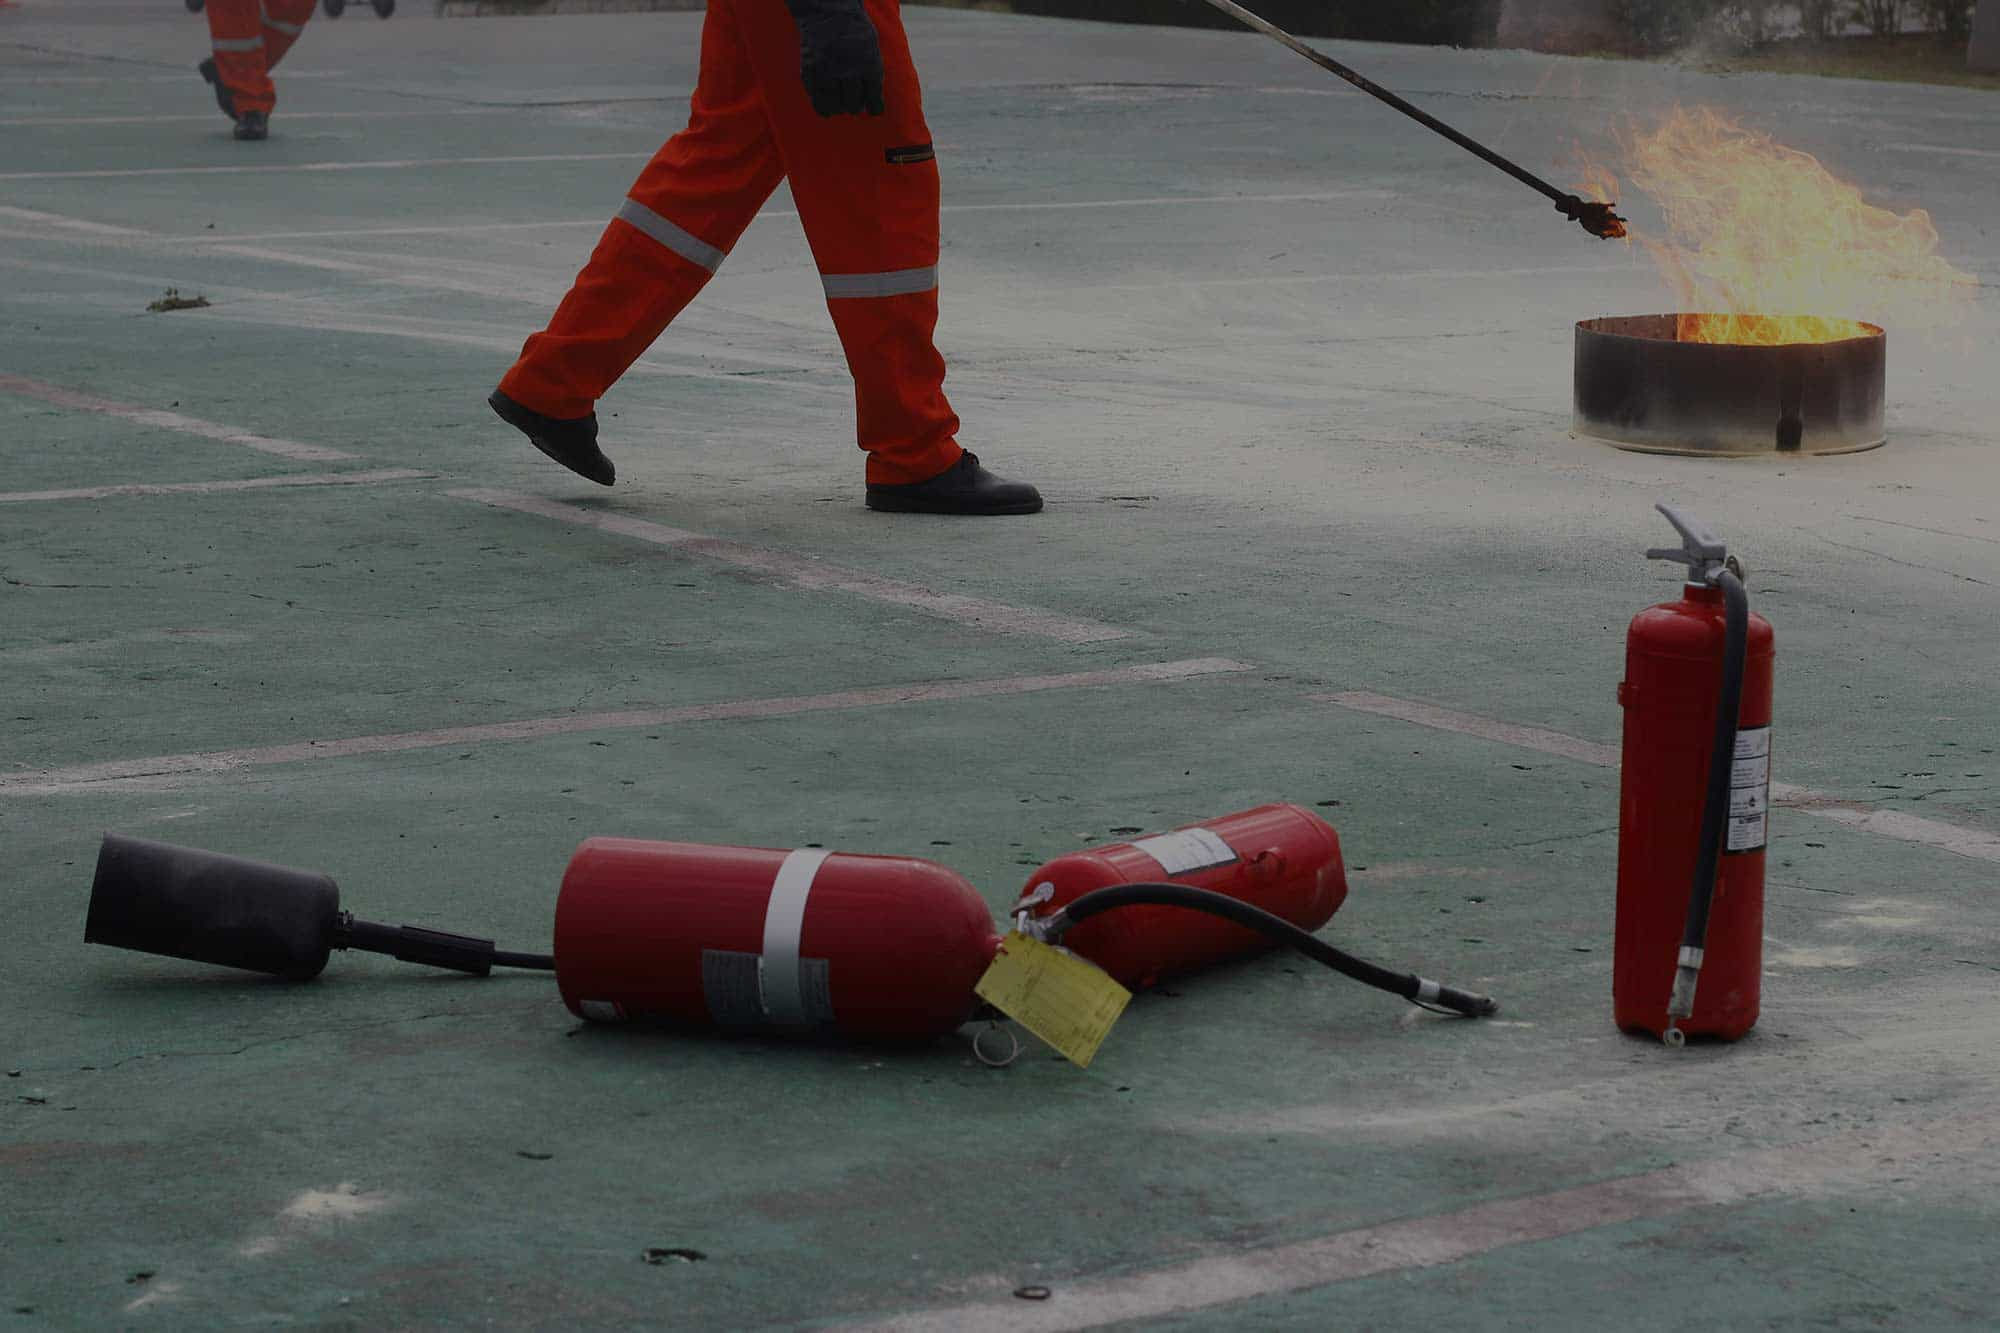 pfi-societe-protection-incendie-formation-slide02